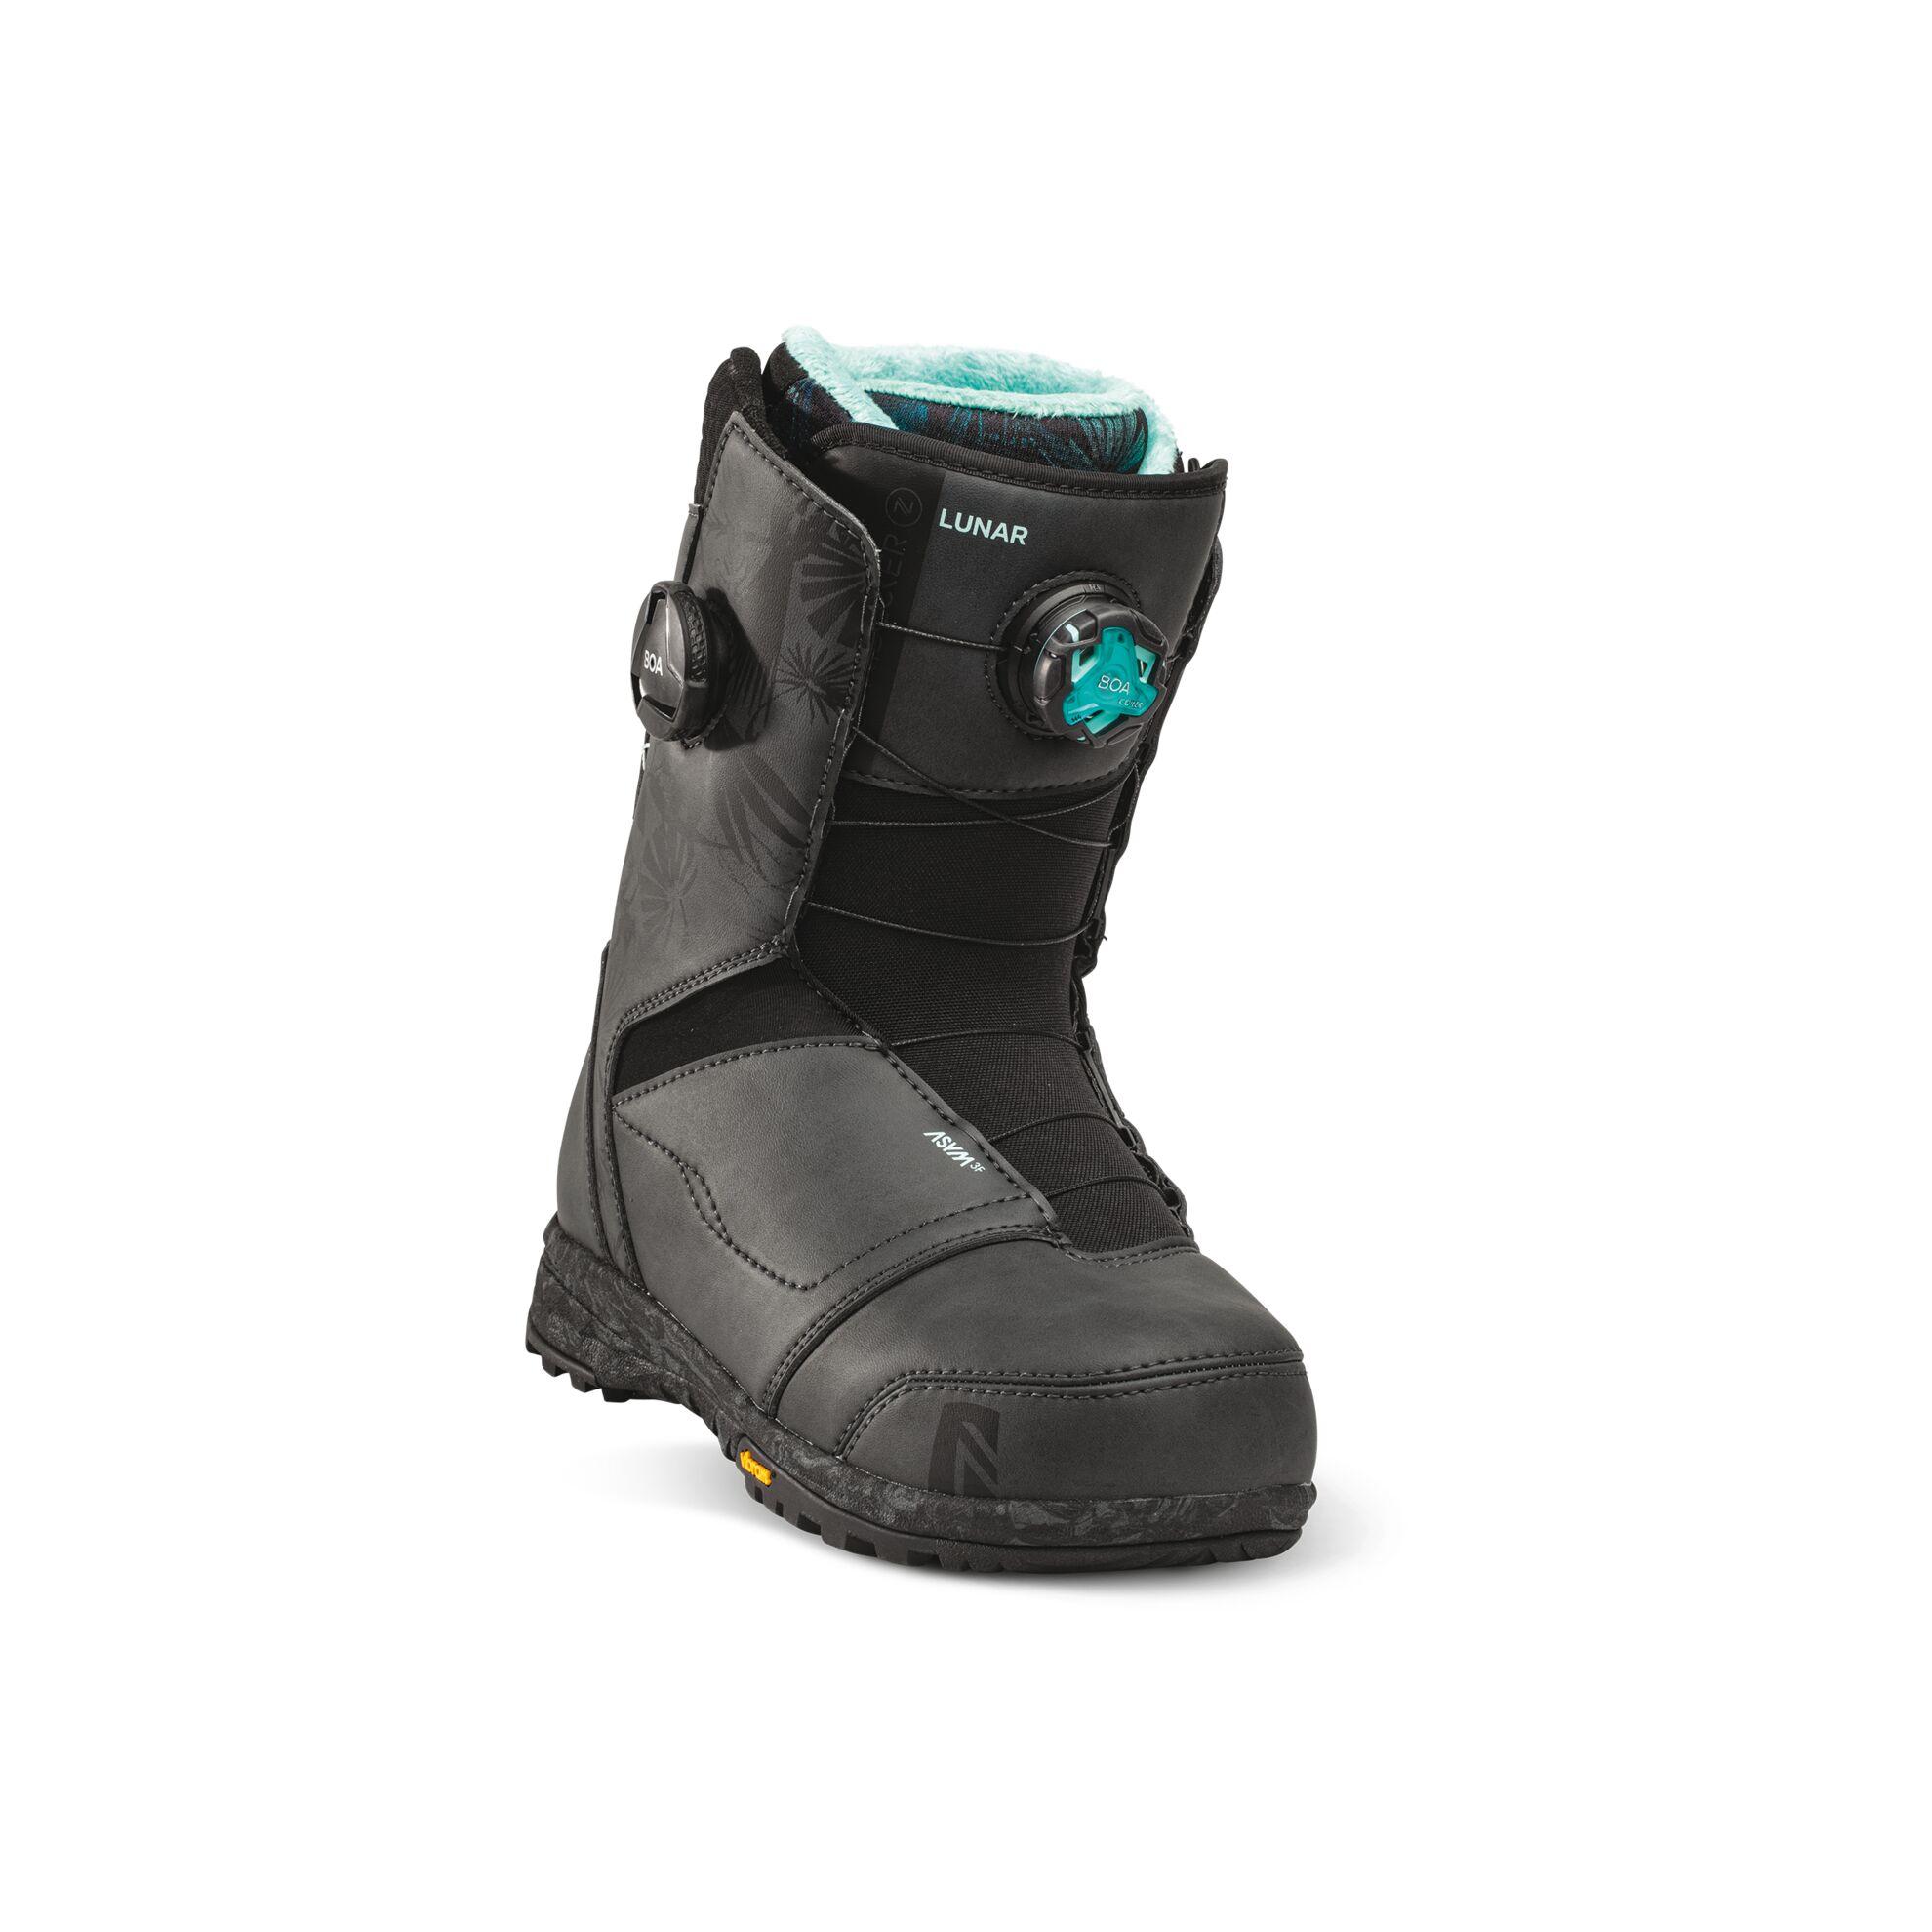 Boots snowboard Femei Nidecker Lunar Hybrid Boa Coiler Negru 20/21 imagine